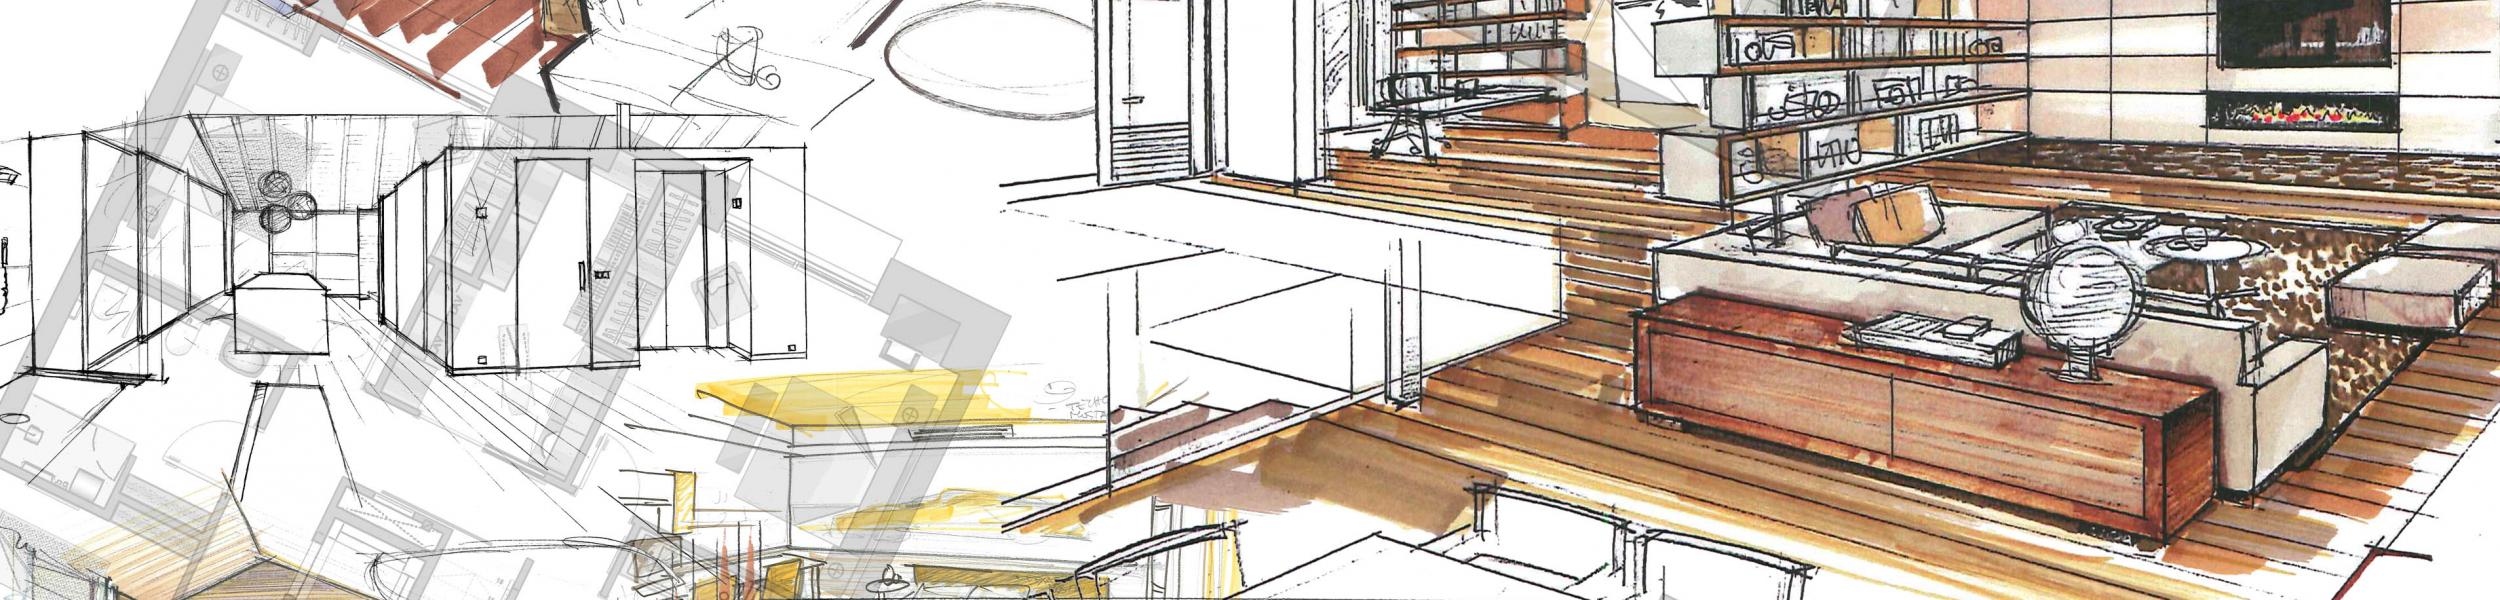 Estudio d az cano interior design estudio de - Estudio interiorismo valencia ...